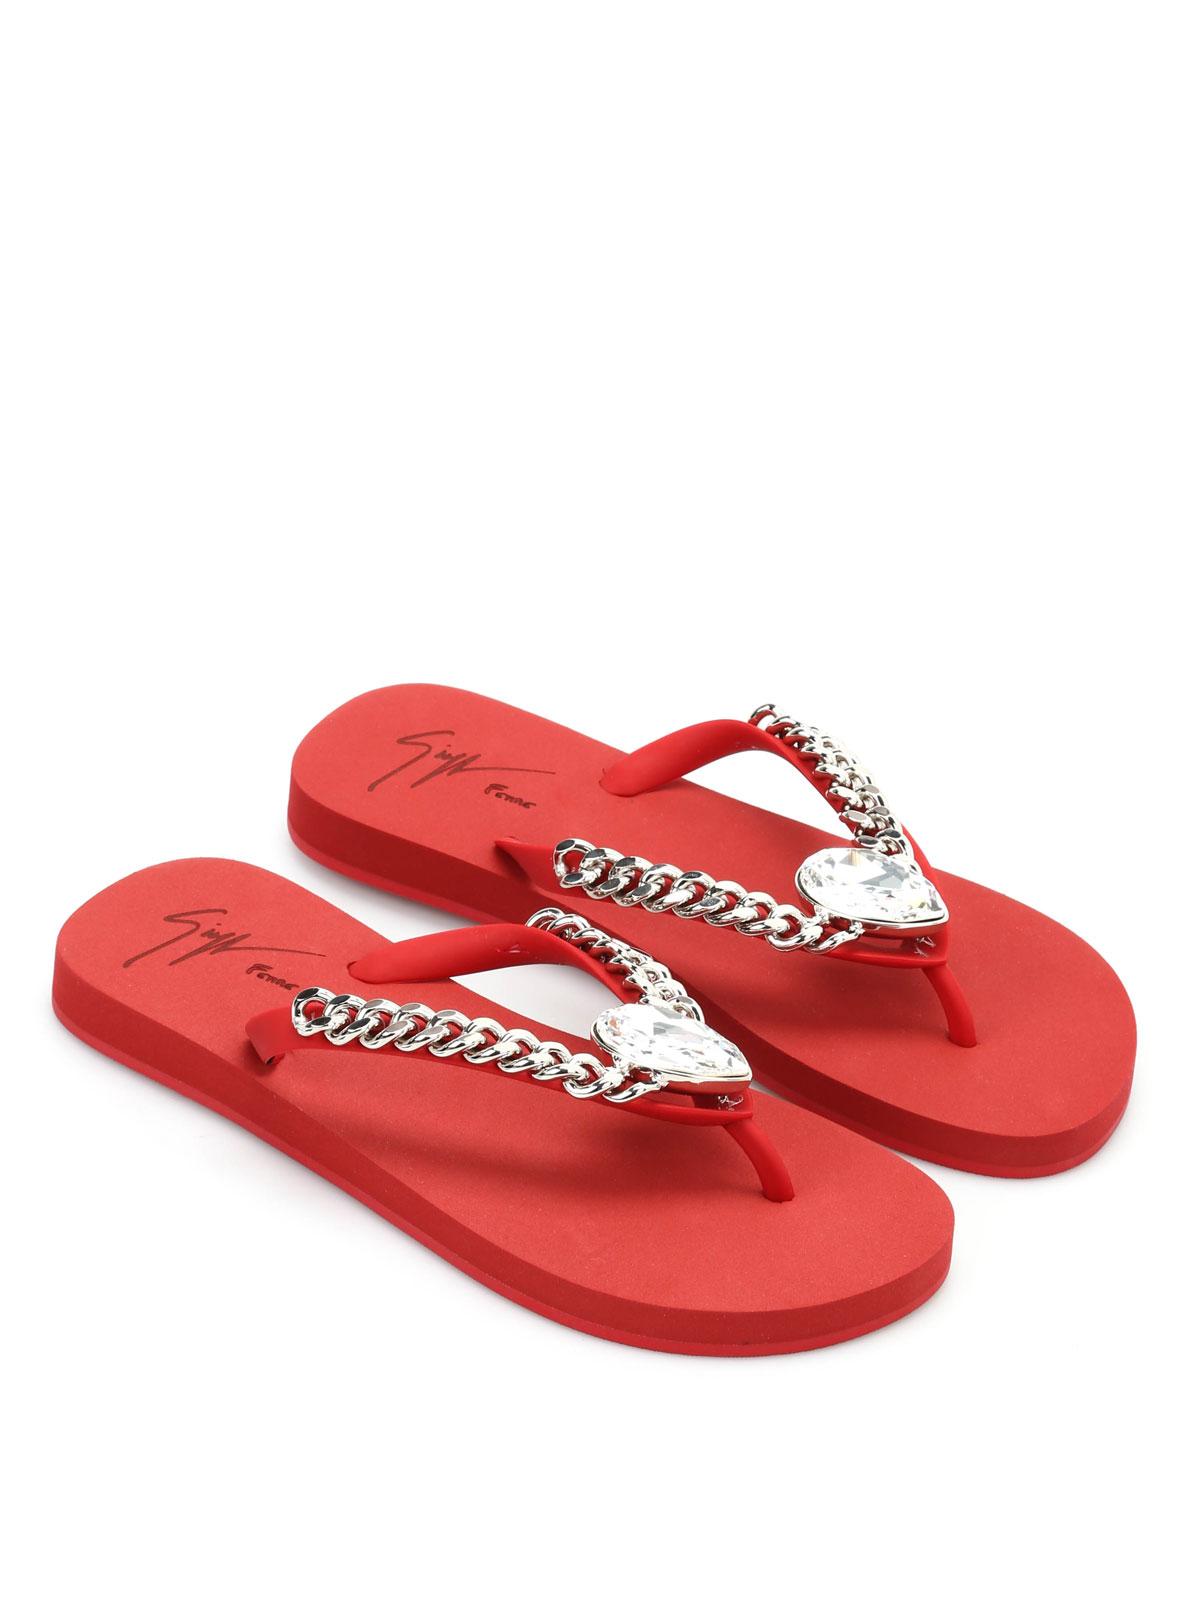 cff53bfd0ee9 Giuseppe Zanotti - Miami Beach rhinestone flip flops - flip flops ...